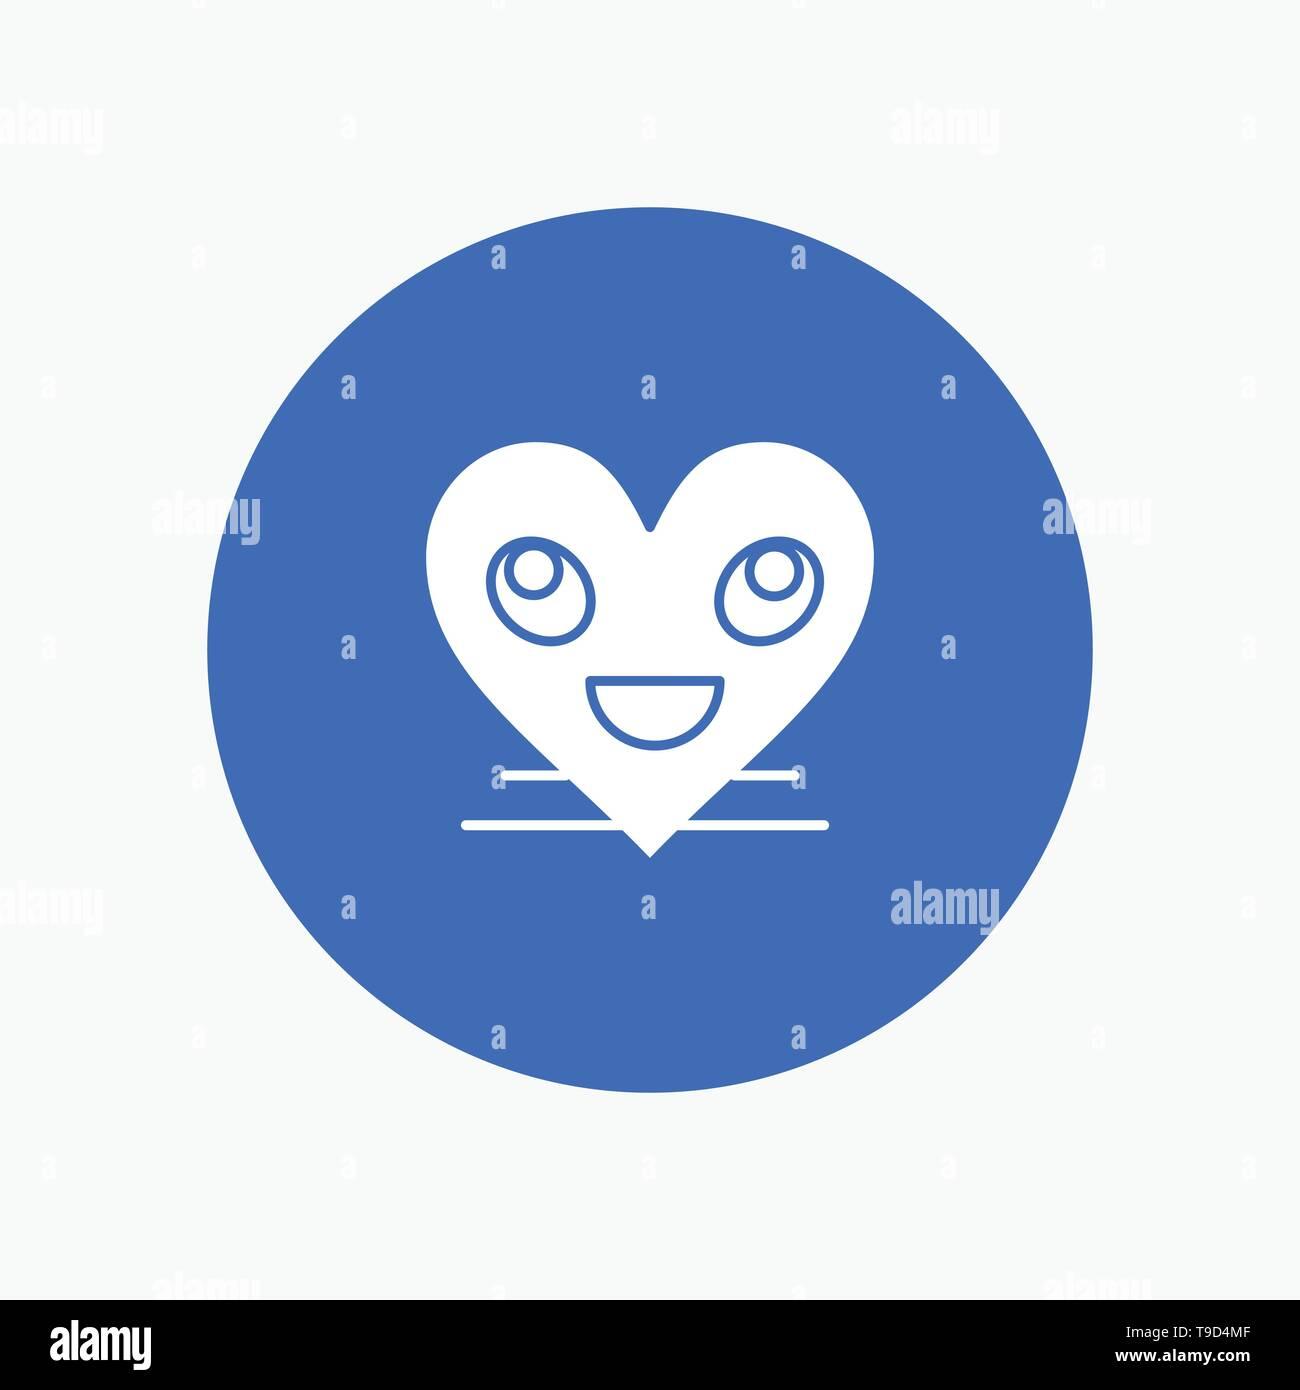 Heart, Emojis, Smiley, Face, Smile Stock Vector Art & Illustration